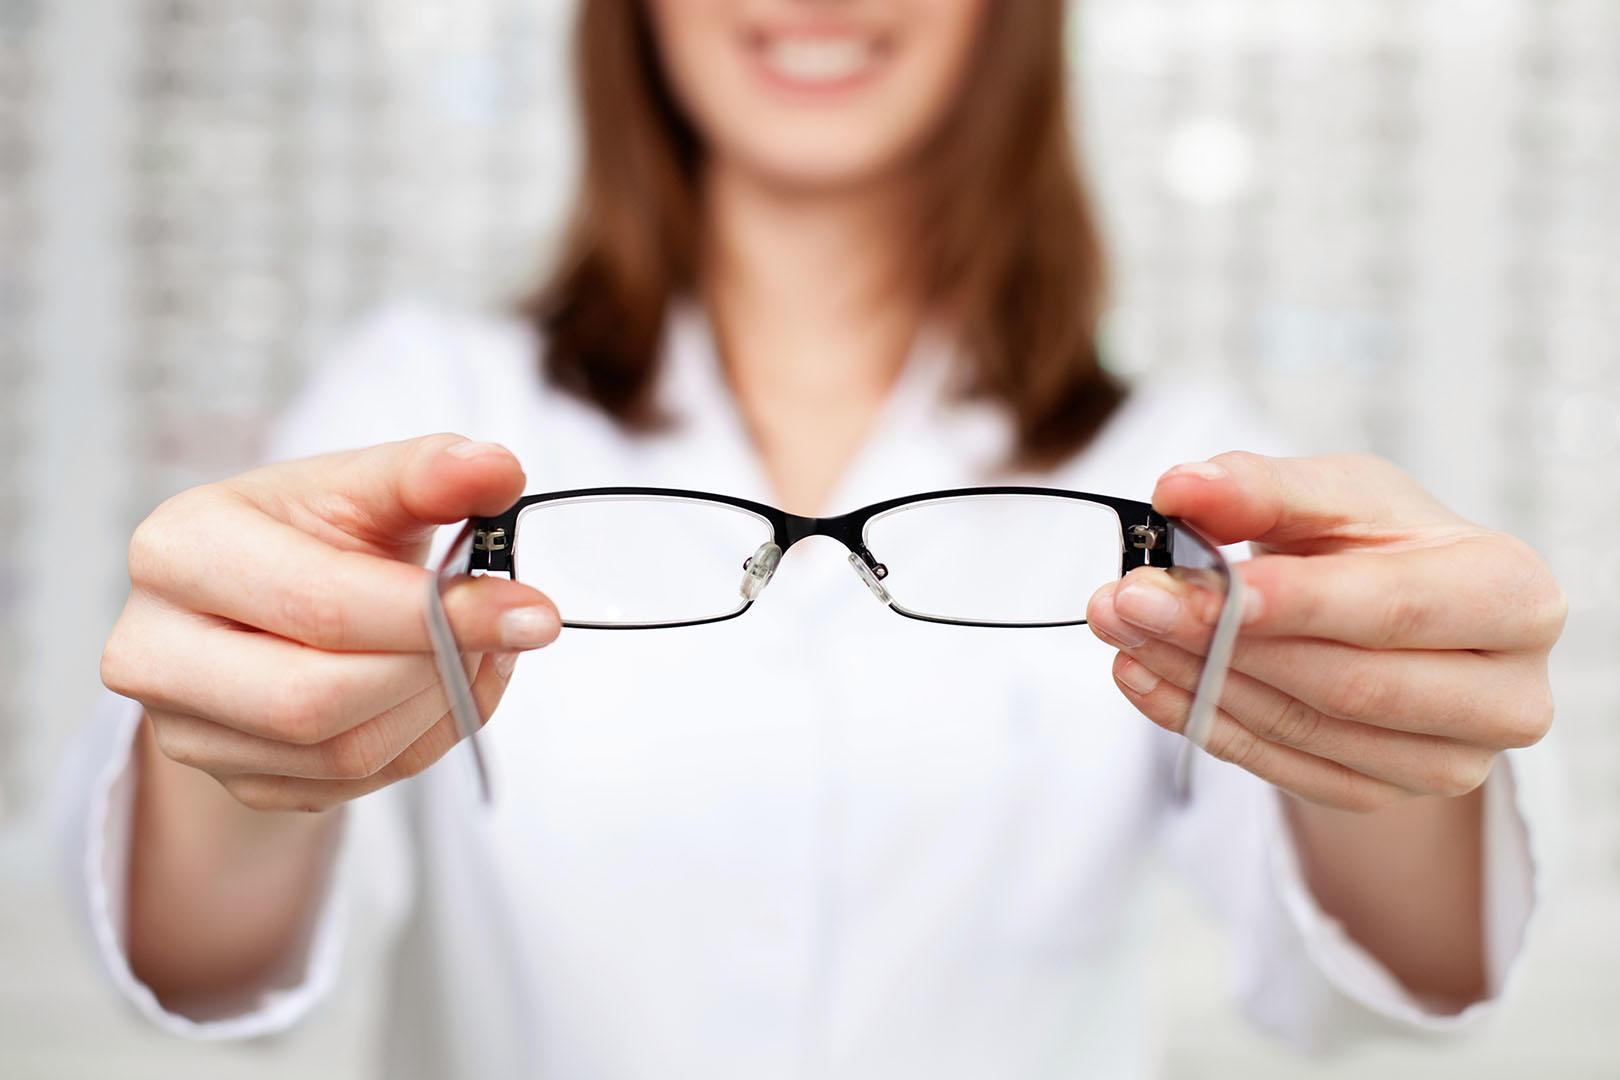 Associates In Vision Care image 2